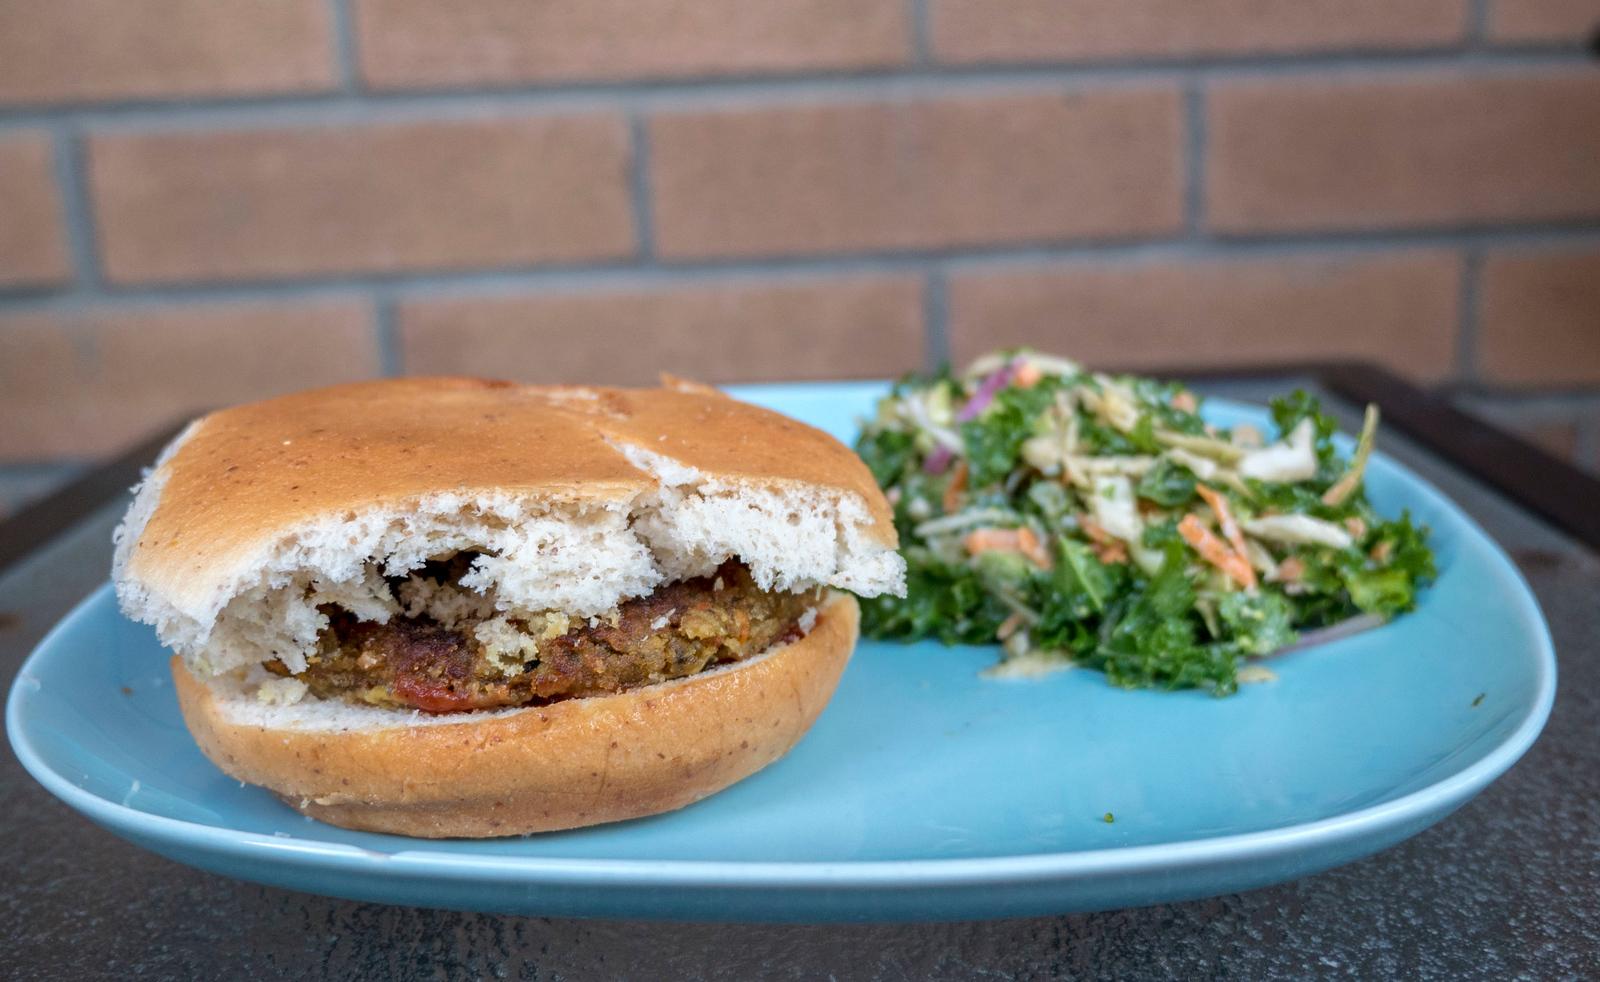 ActivEats Vegan Meal Delivery Service in Toronto & GTA